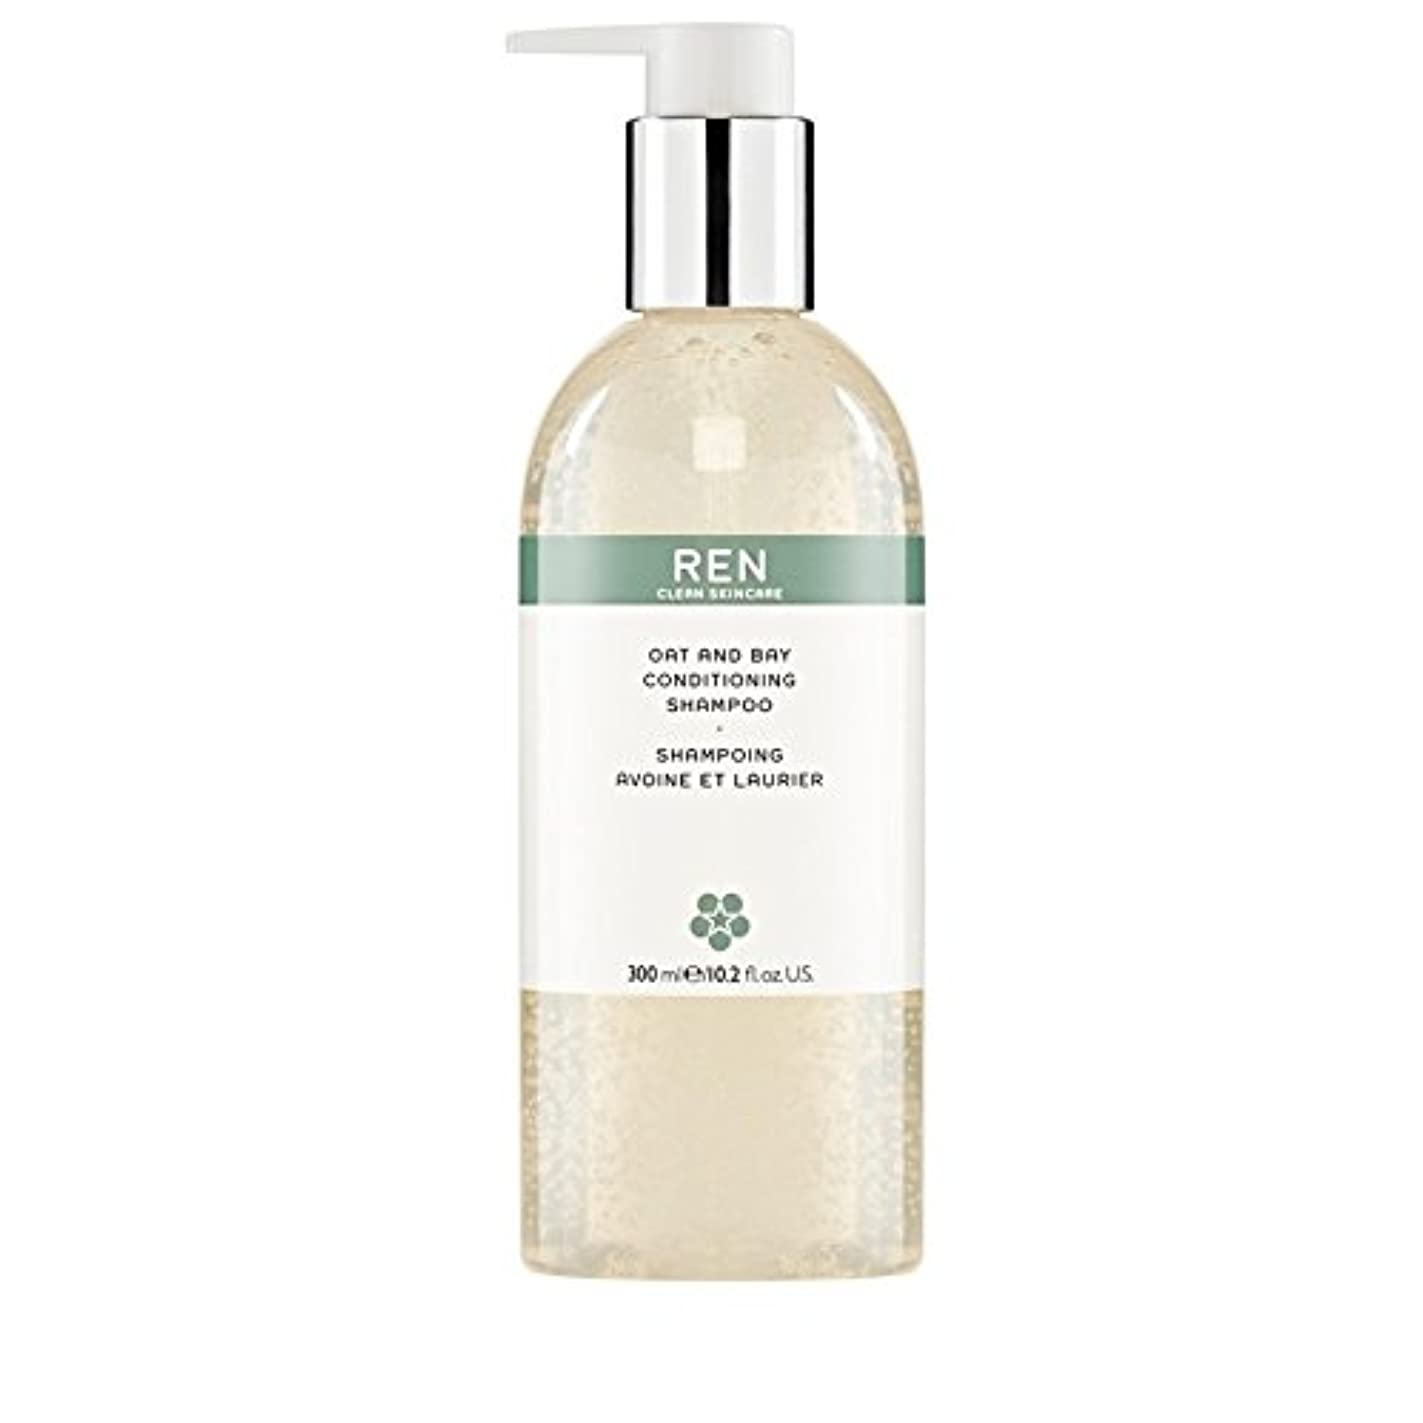 REN Oat and Bay Conditioning Shampoo 300ml - オート麦とベイコンディショニングシャンプー300ミリリットル [並行輸入品]